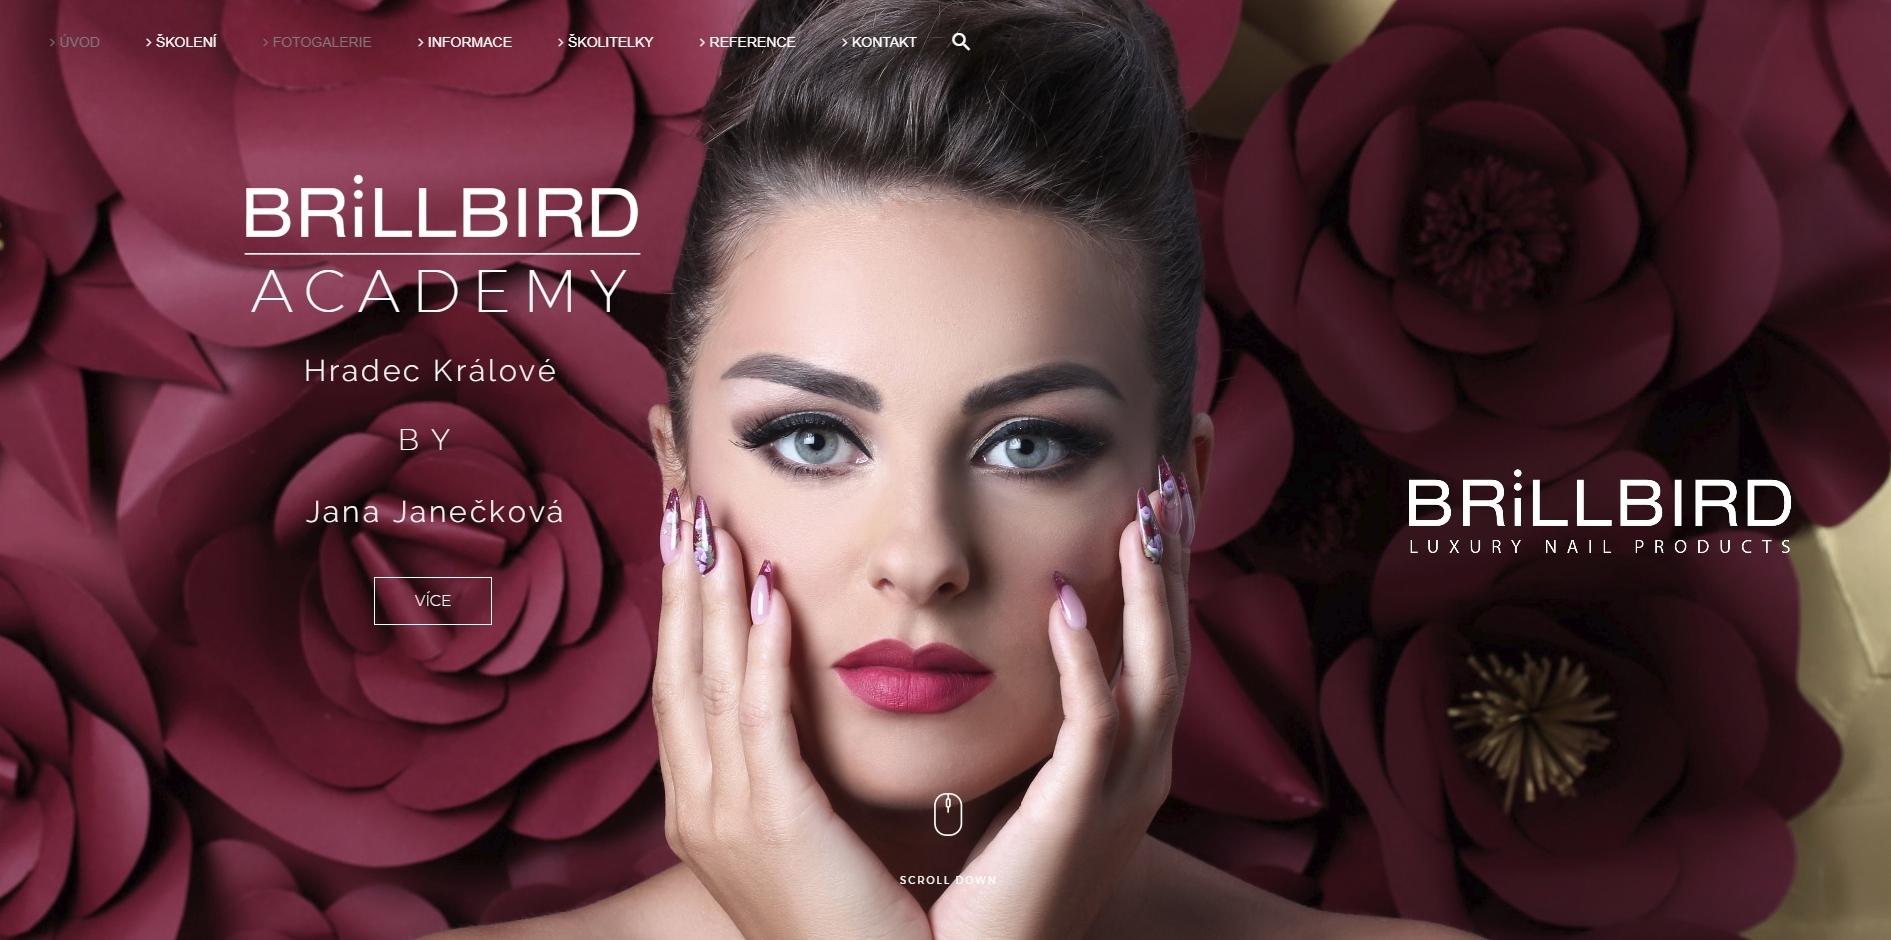 BrillBird Academy - nový web